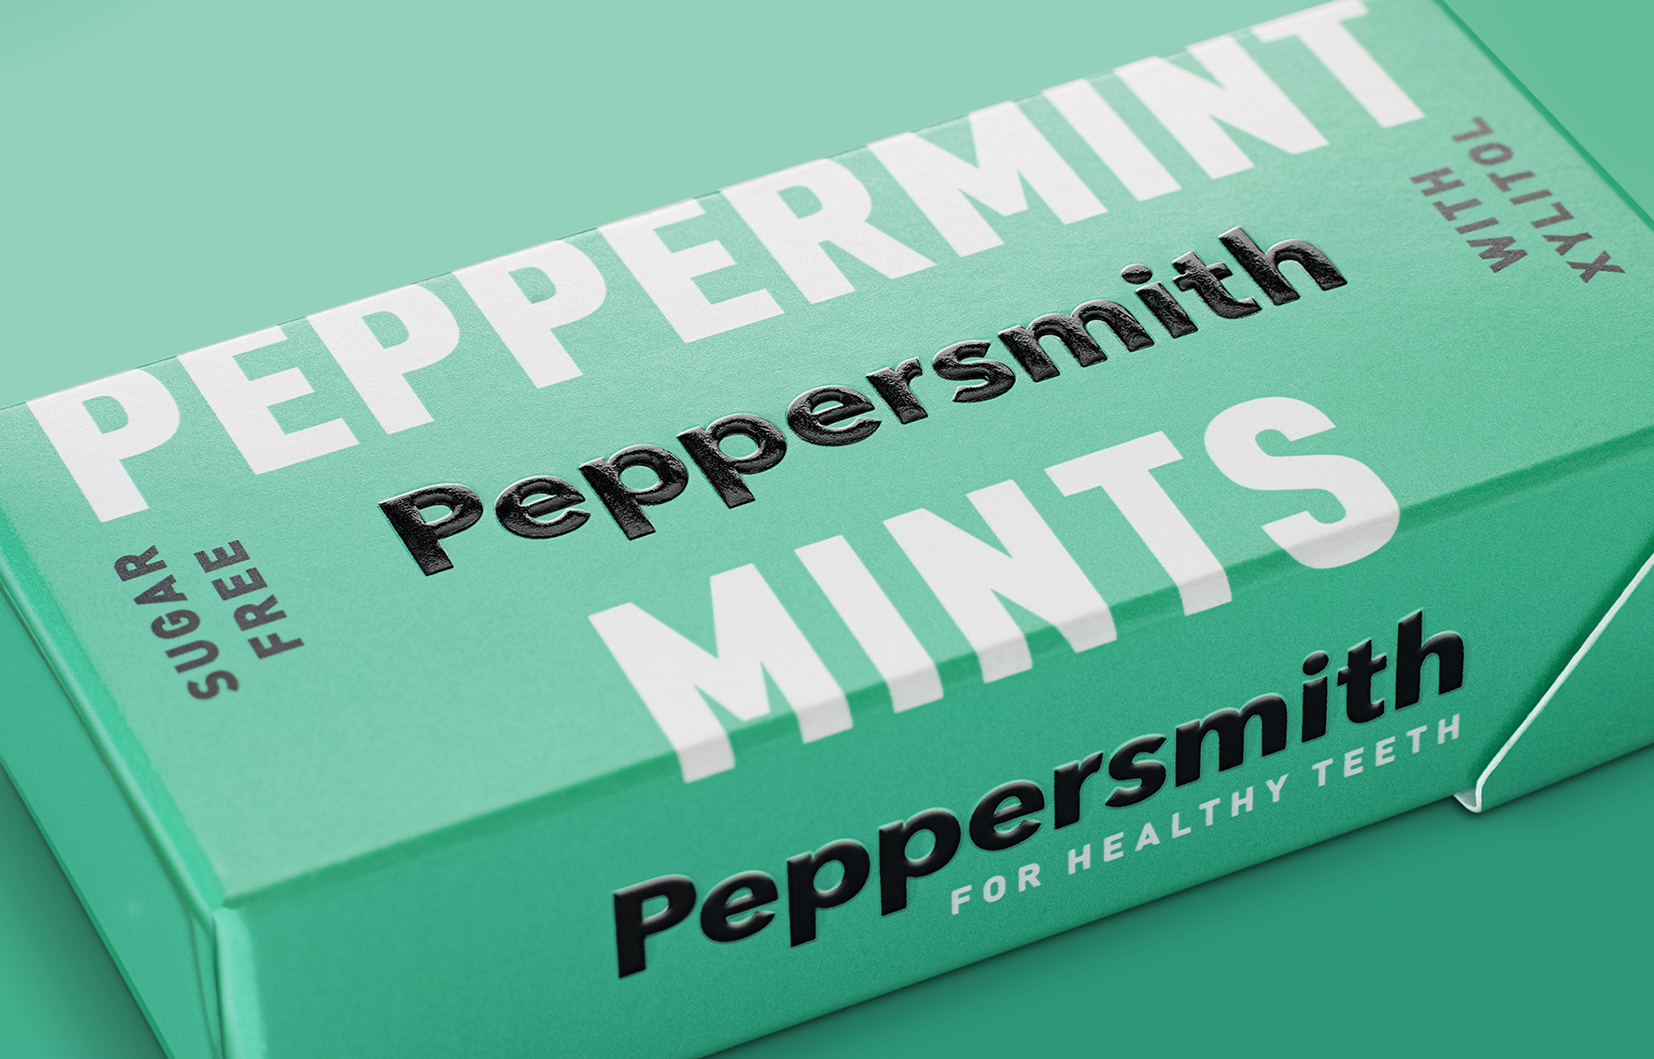 B&B studio - Peppersmith Rebrand3.jpg